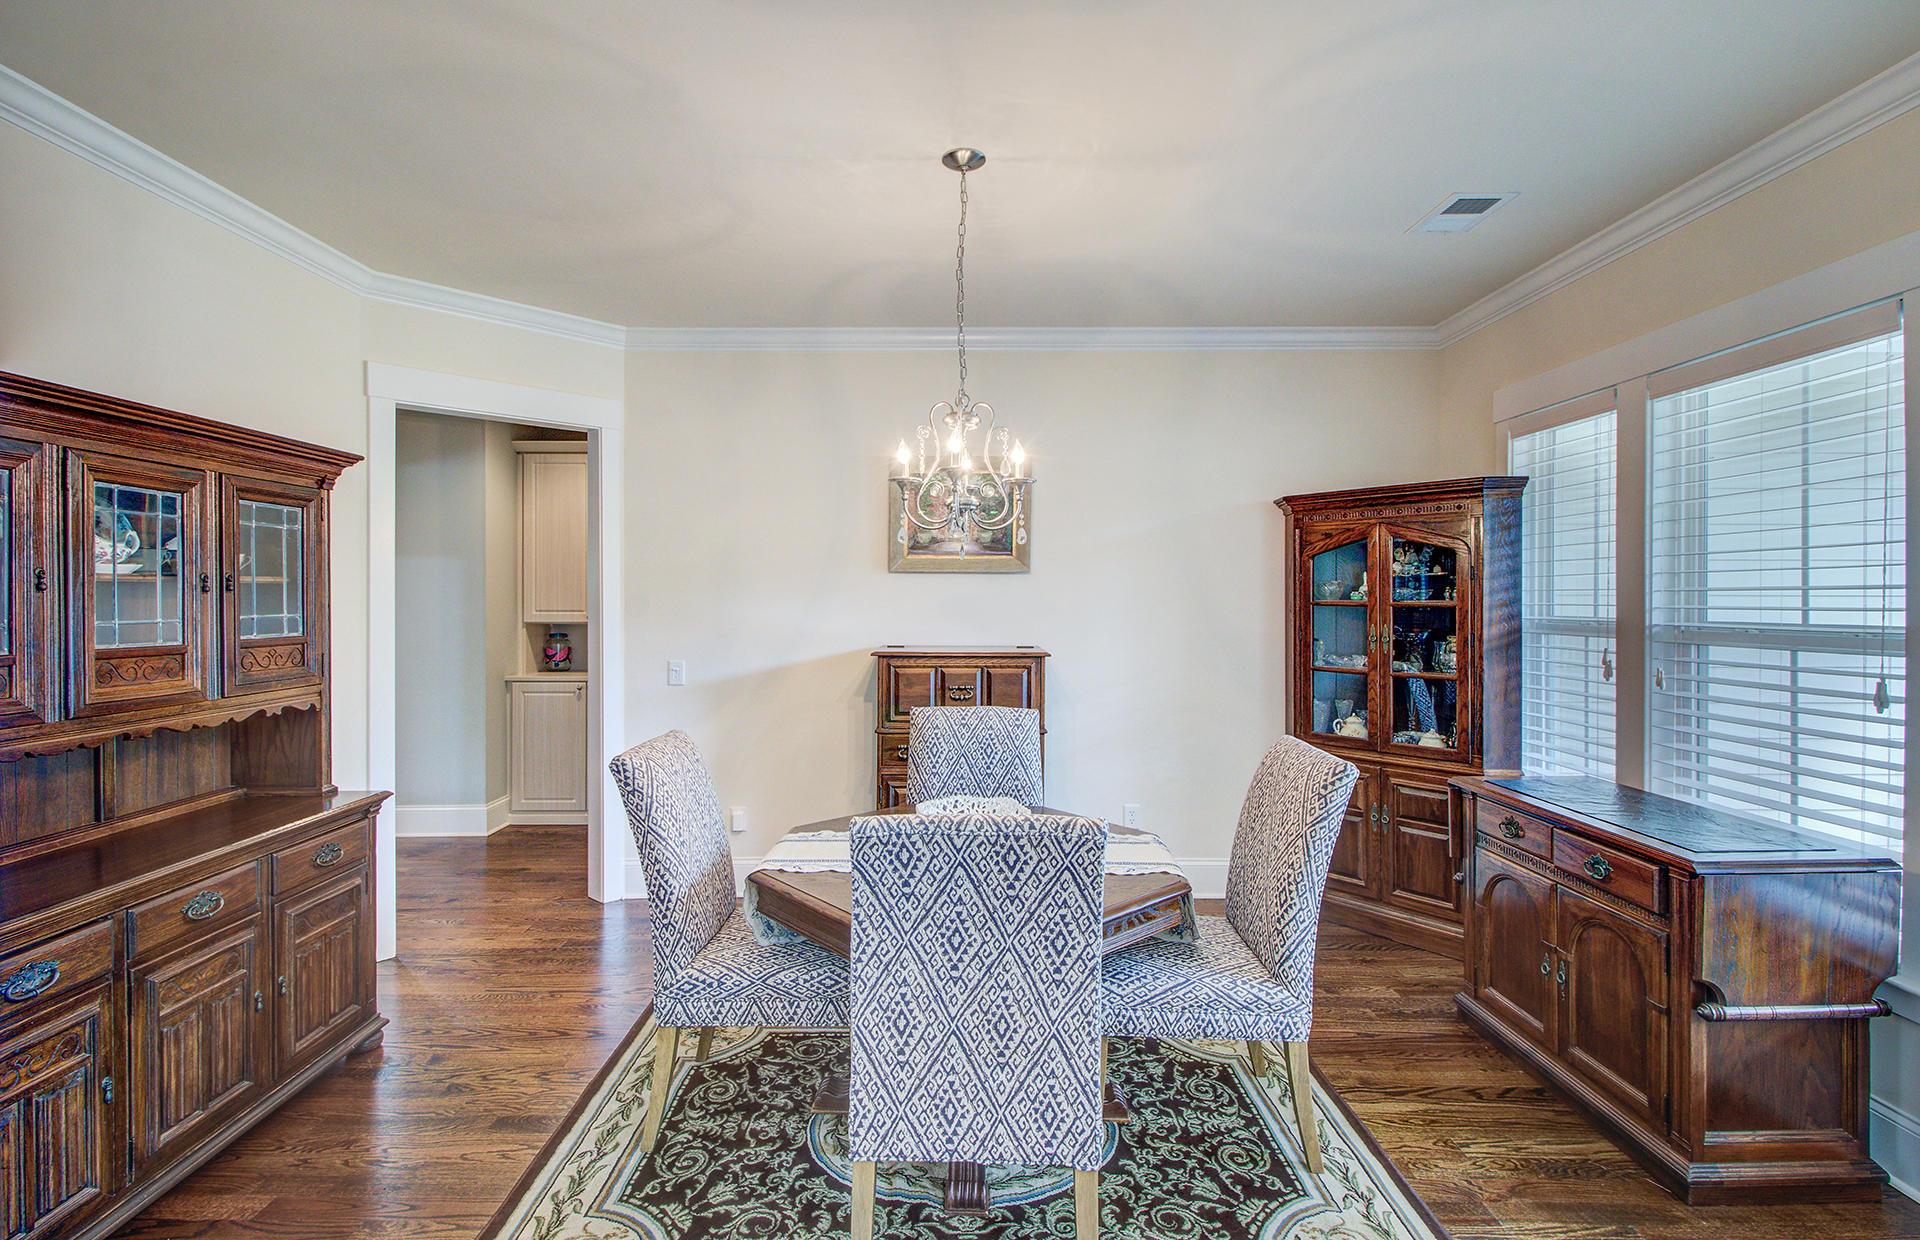 Scotts Creek Homes For Sale - 1404 Scotts Creek, Mount Pleasant, SC - 47